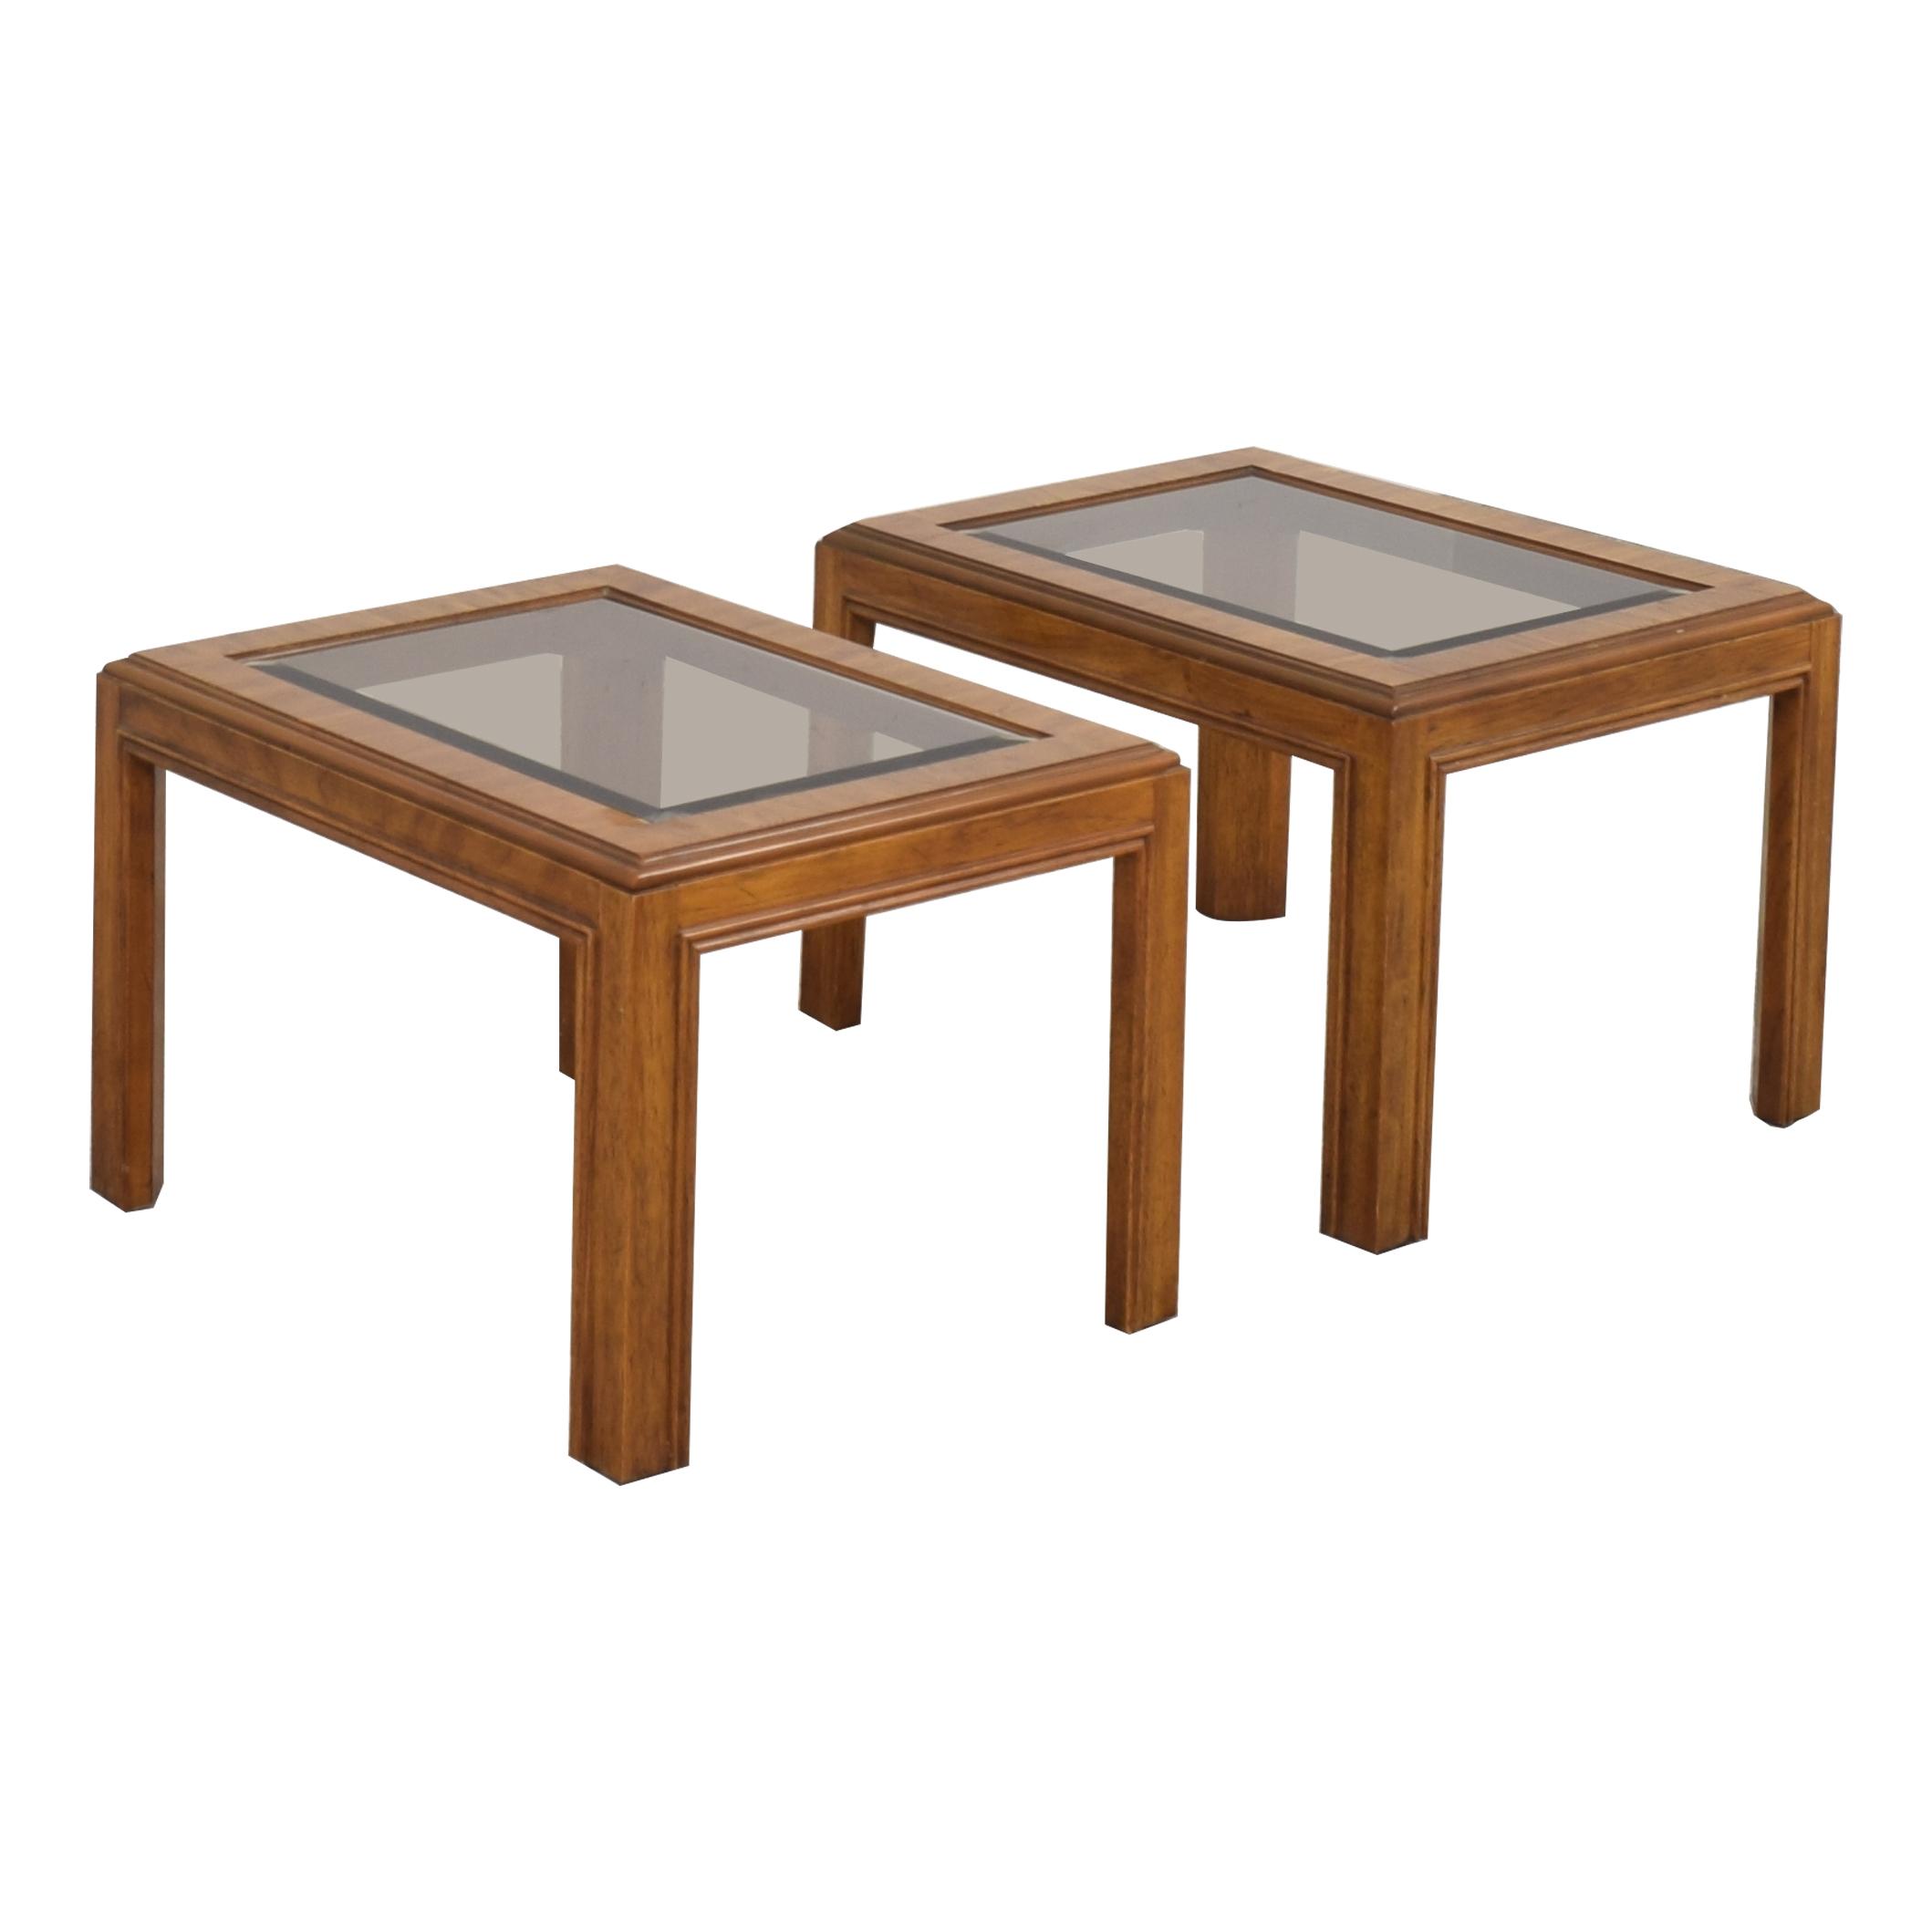 Drexel Heritage Drexel Heritage Mid-Century End Tables on sale